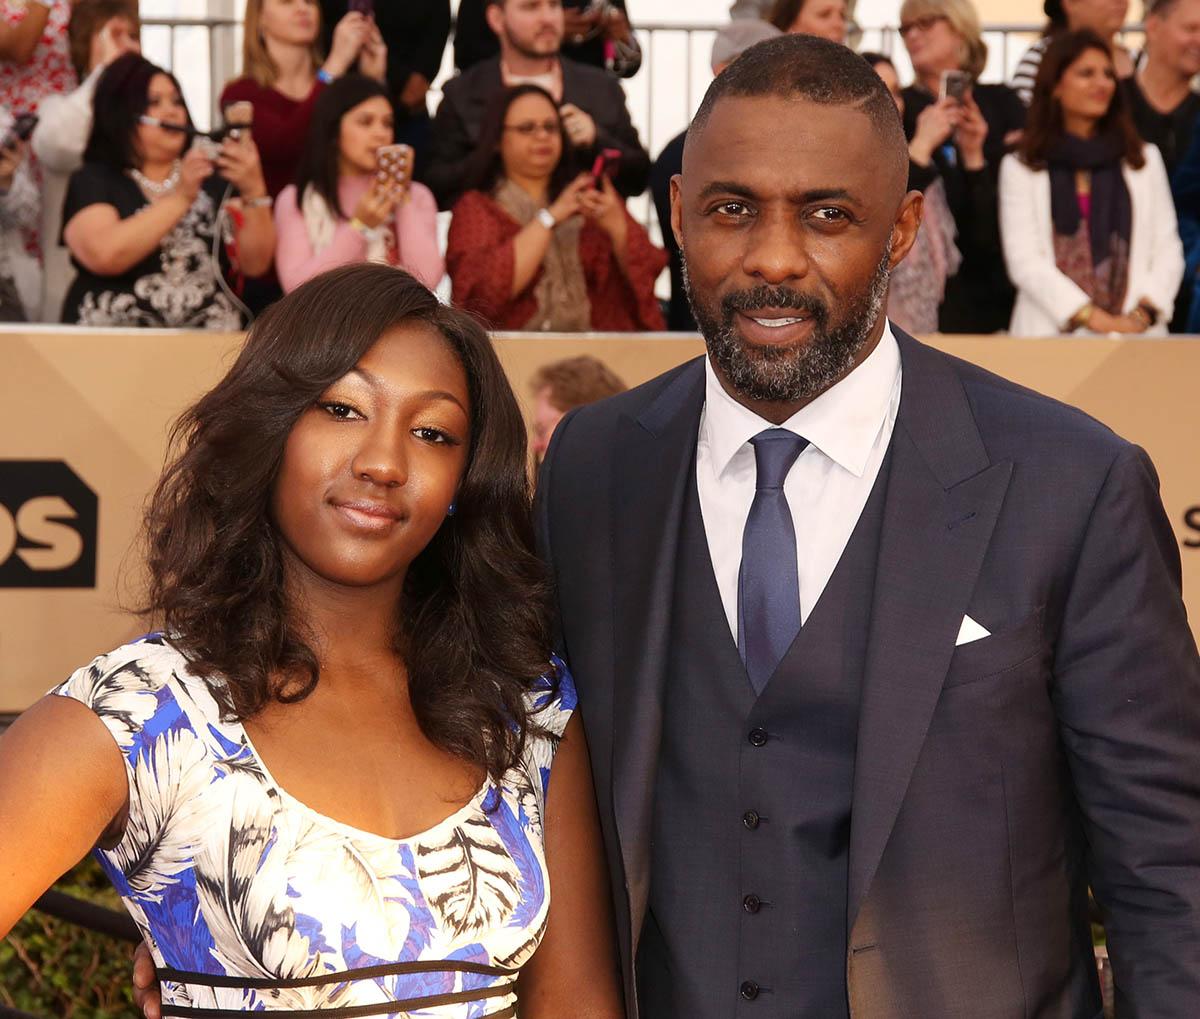 Isan Elba and dad Idris Elba attend 2nd Annual Screen Actors Guild Awards in LA